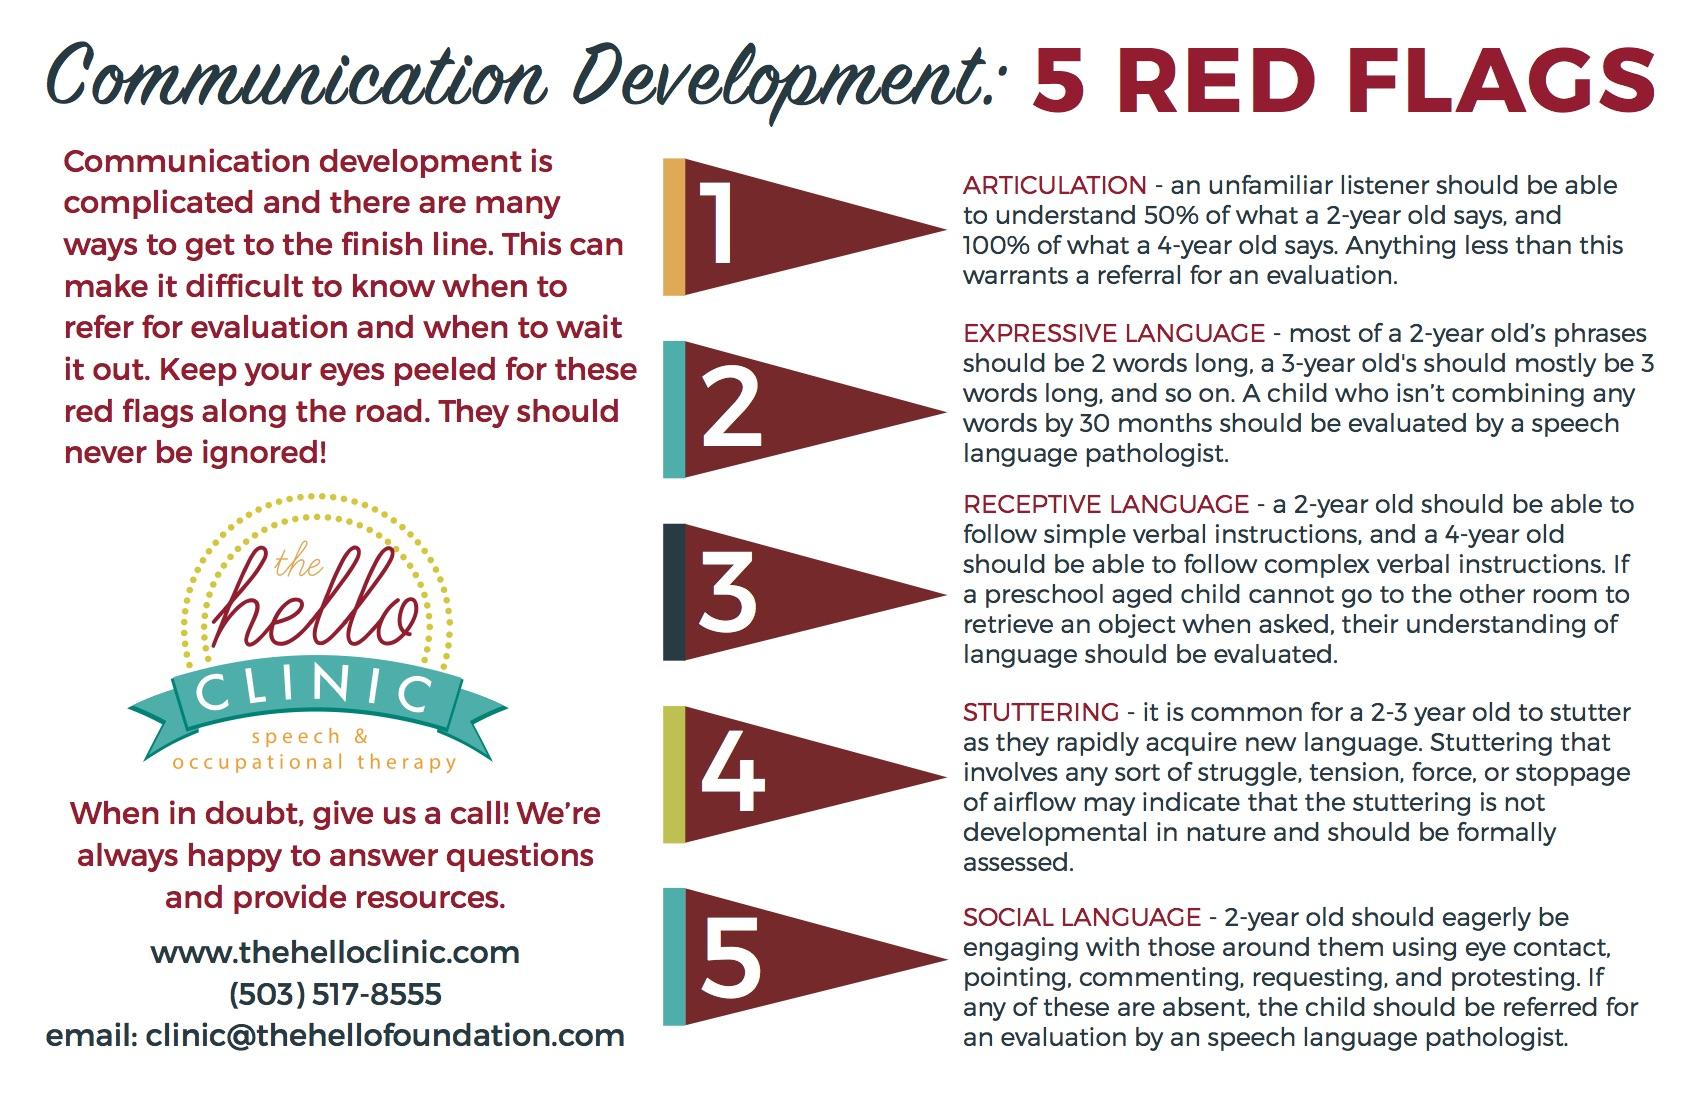 communication development red flags